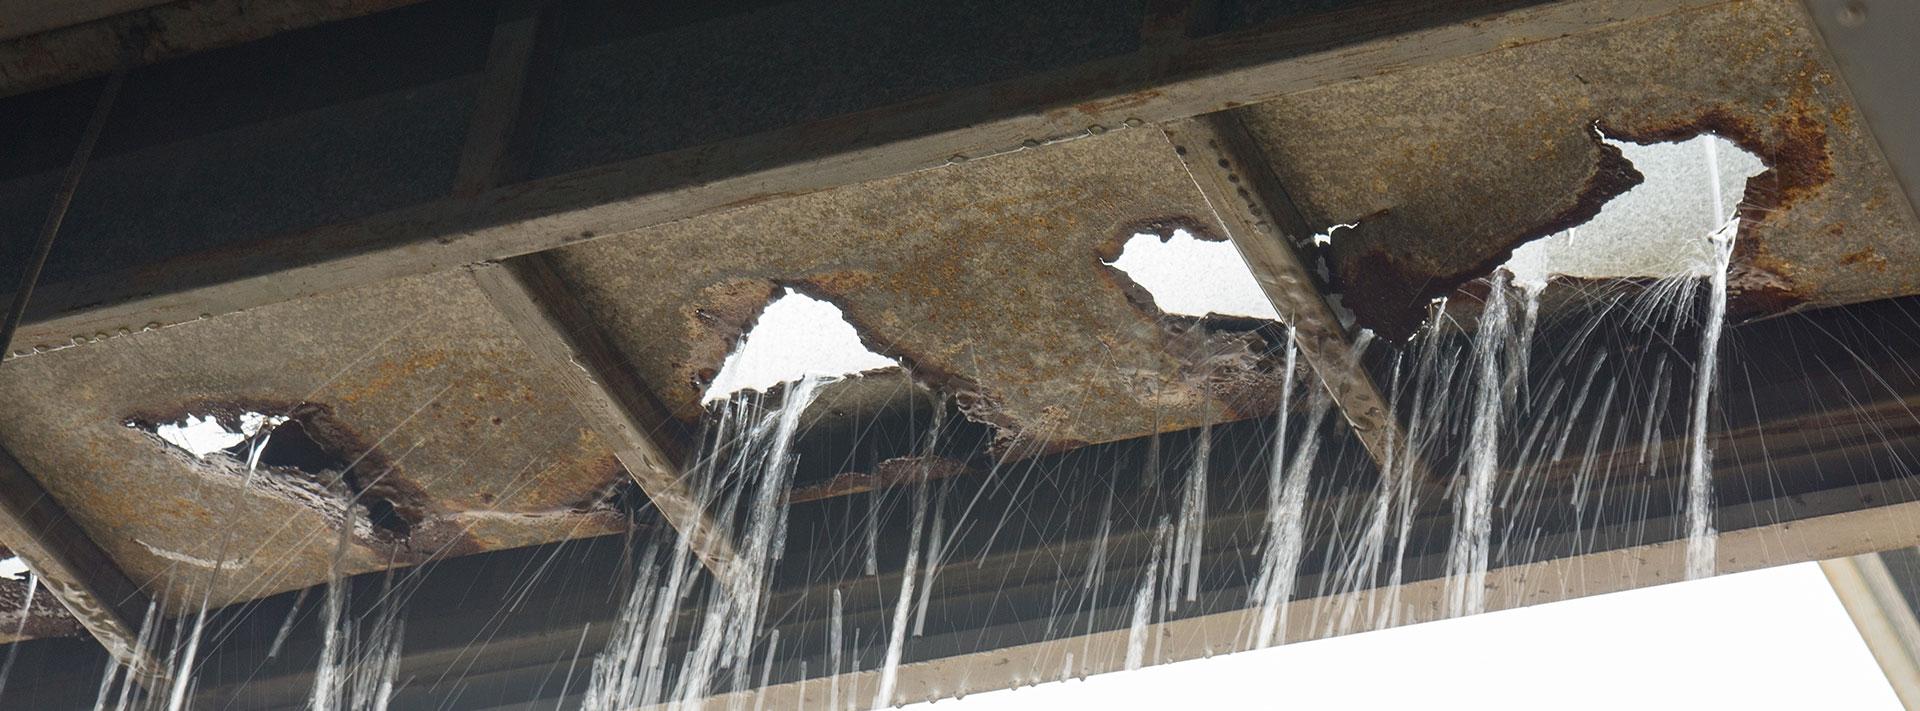 Building leak repair - If it leaks, we can fix it!